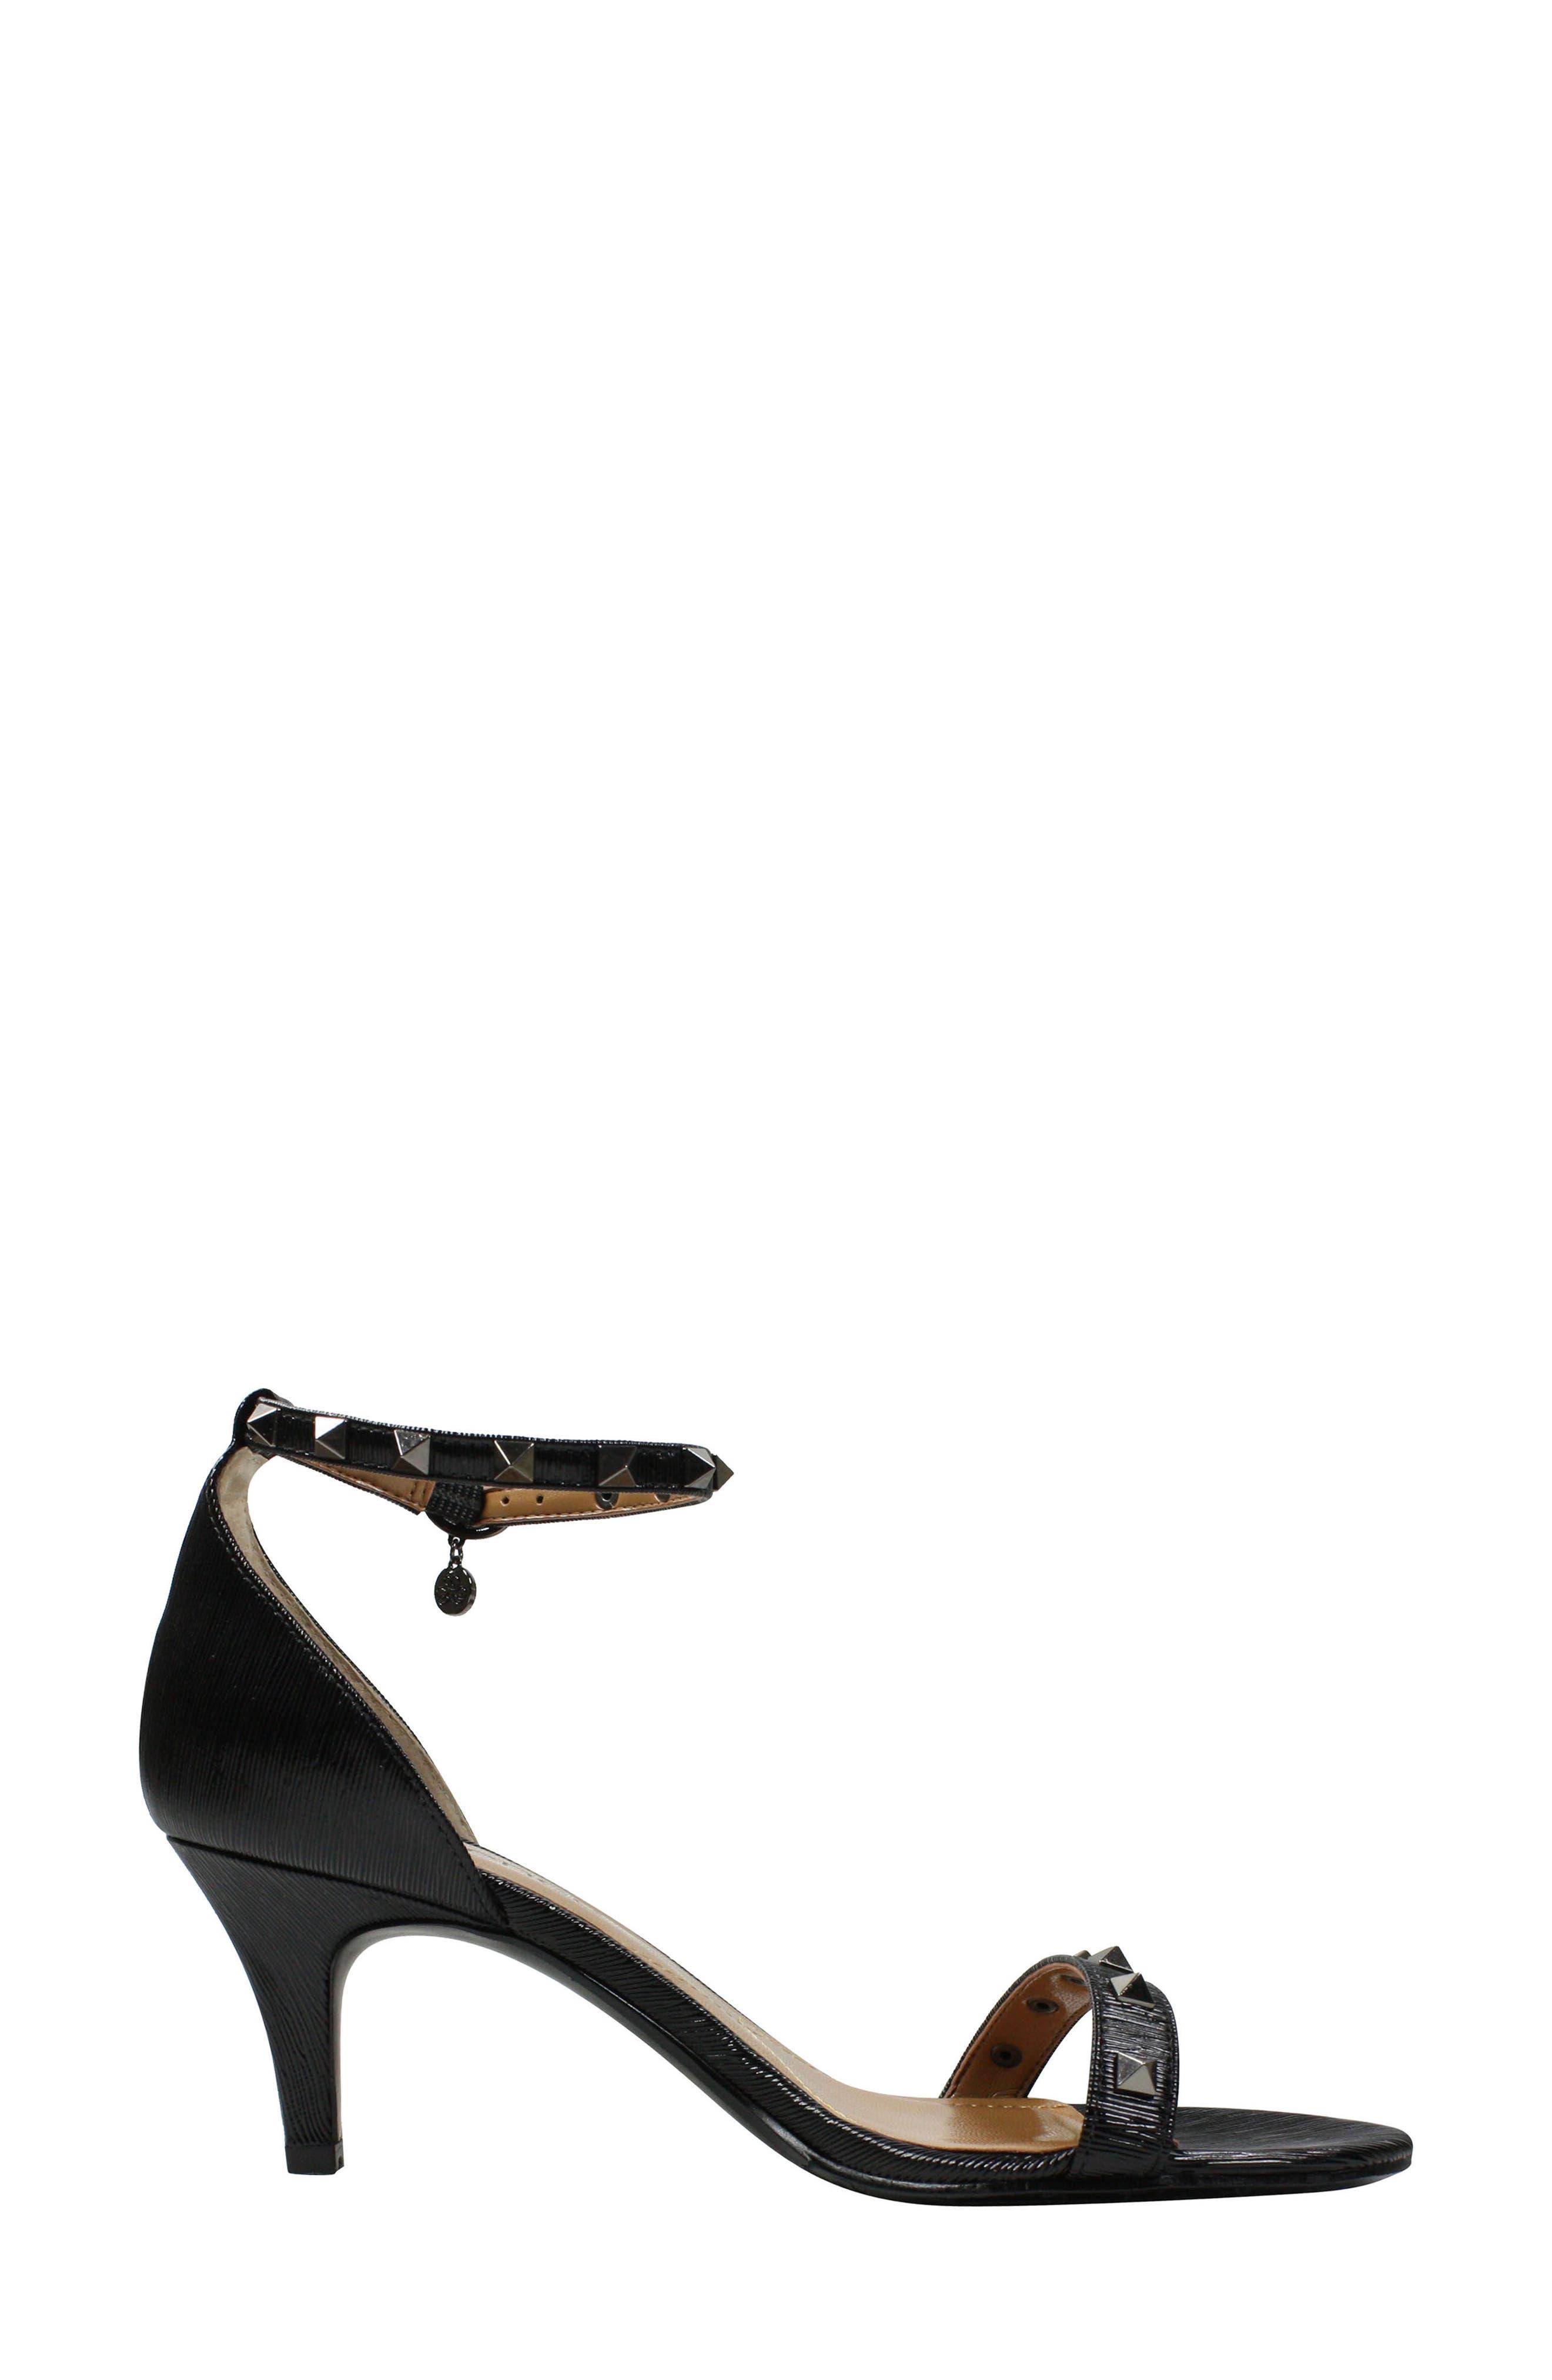 Lerida Studded Ankle Strap Sandal,                             Alternate thumbnail 2, color,                             001